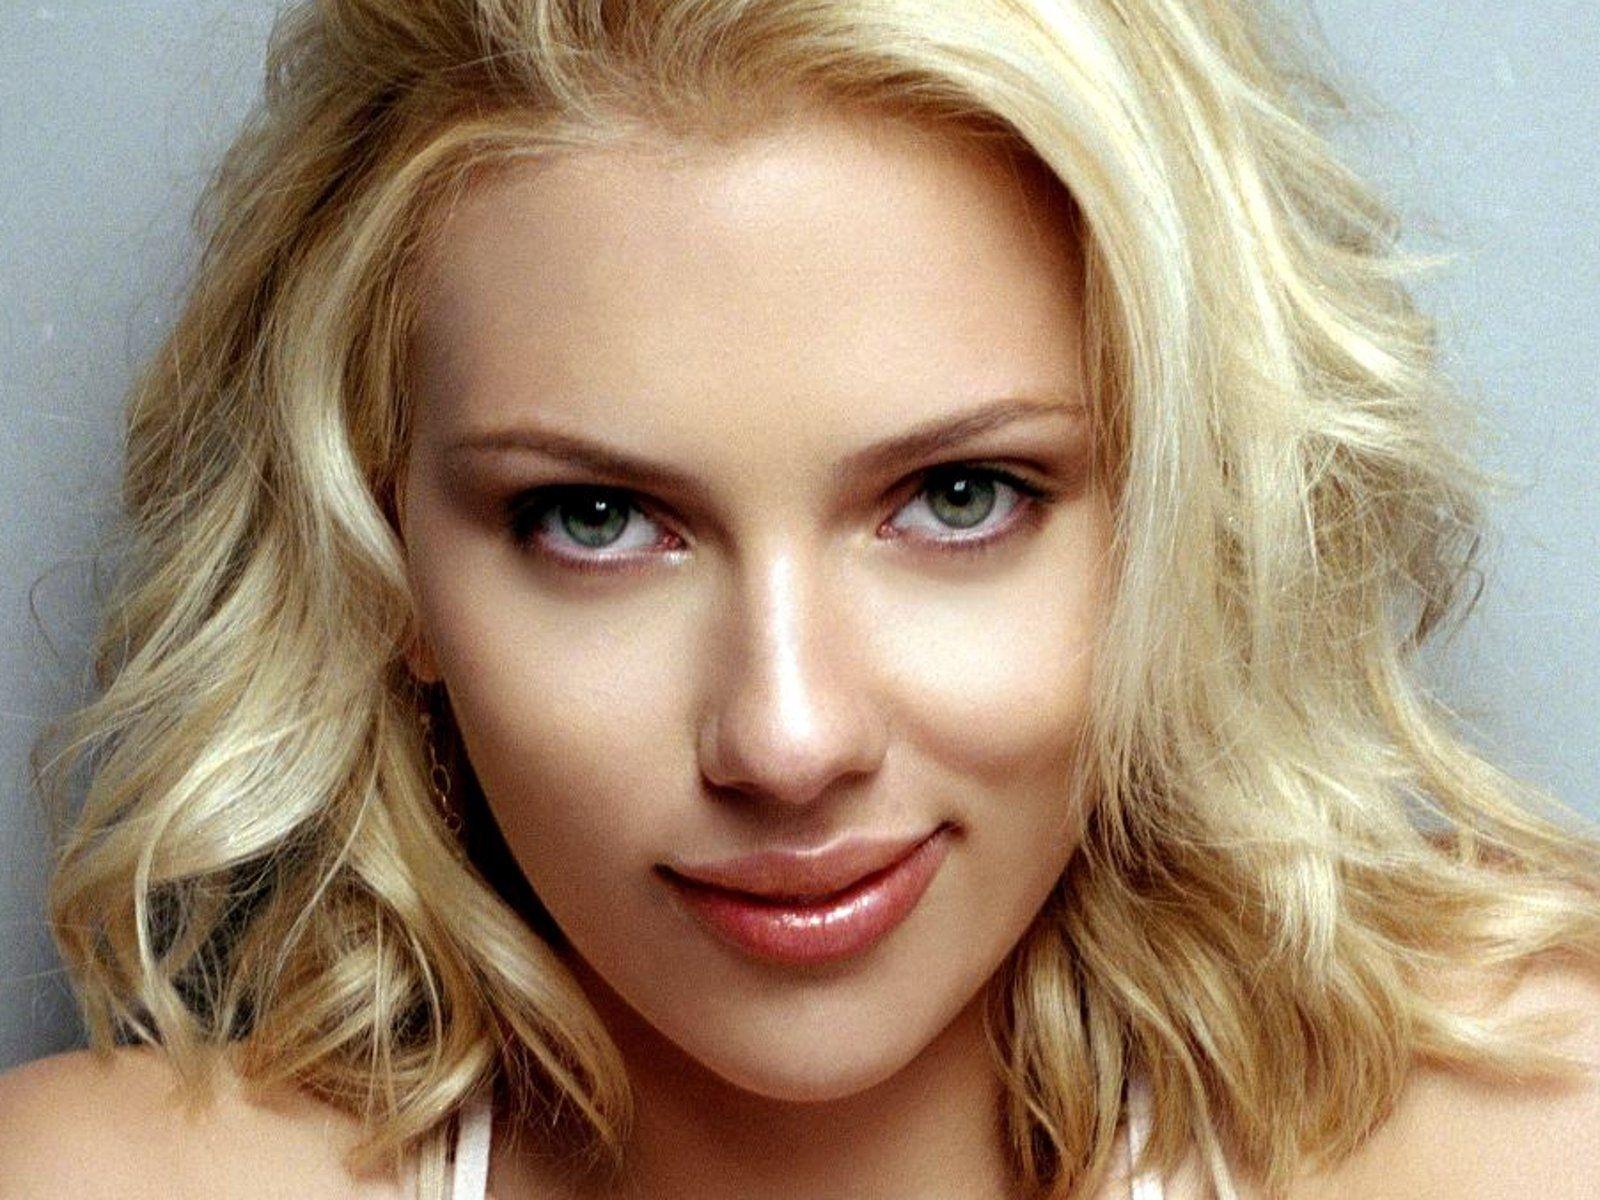 De nuevo hackearon fotos de Scarlett Johansson al desnudo